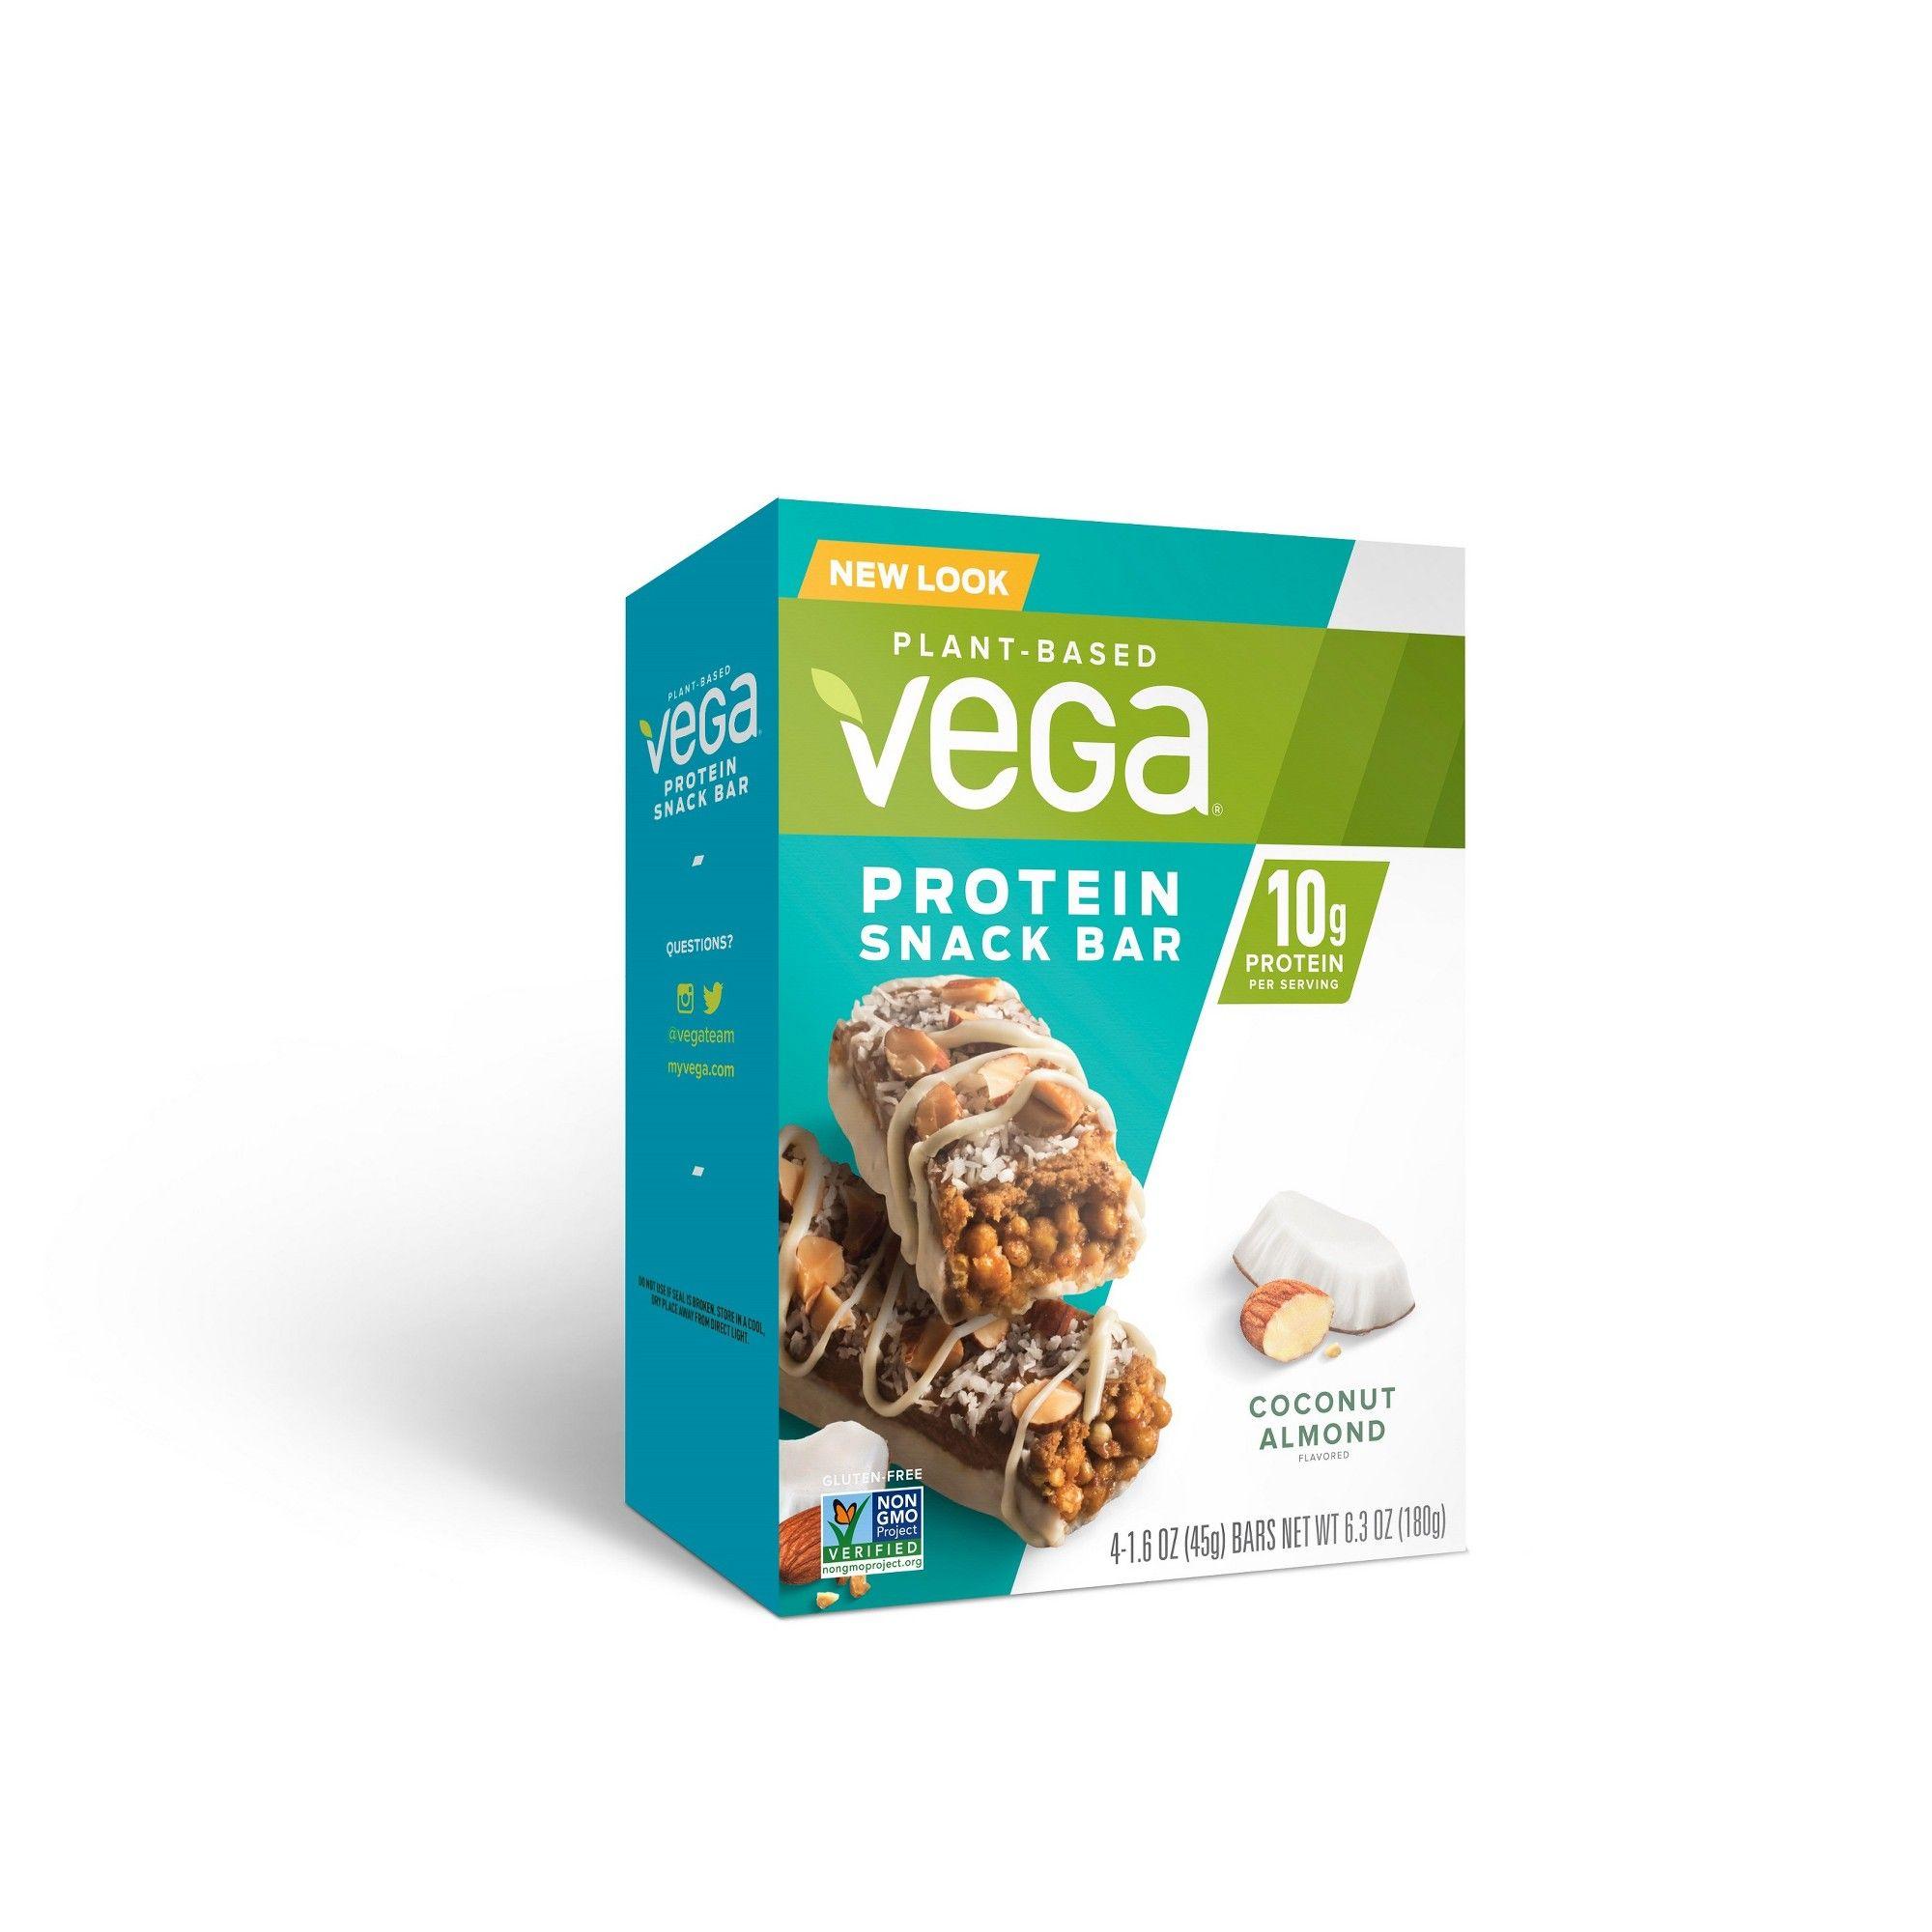 Vega Protein Bar Coconut Almond 4ct Vegan bar